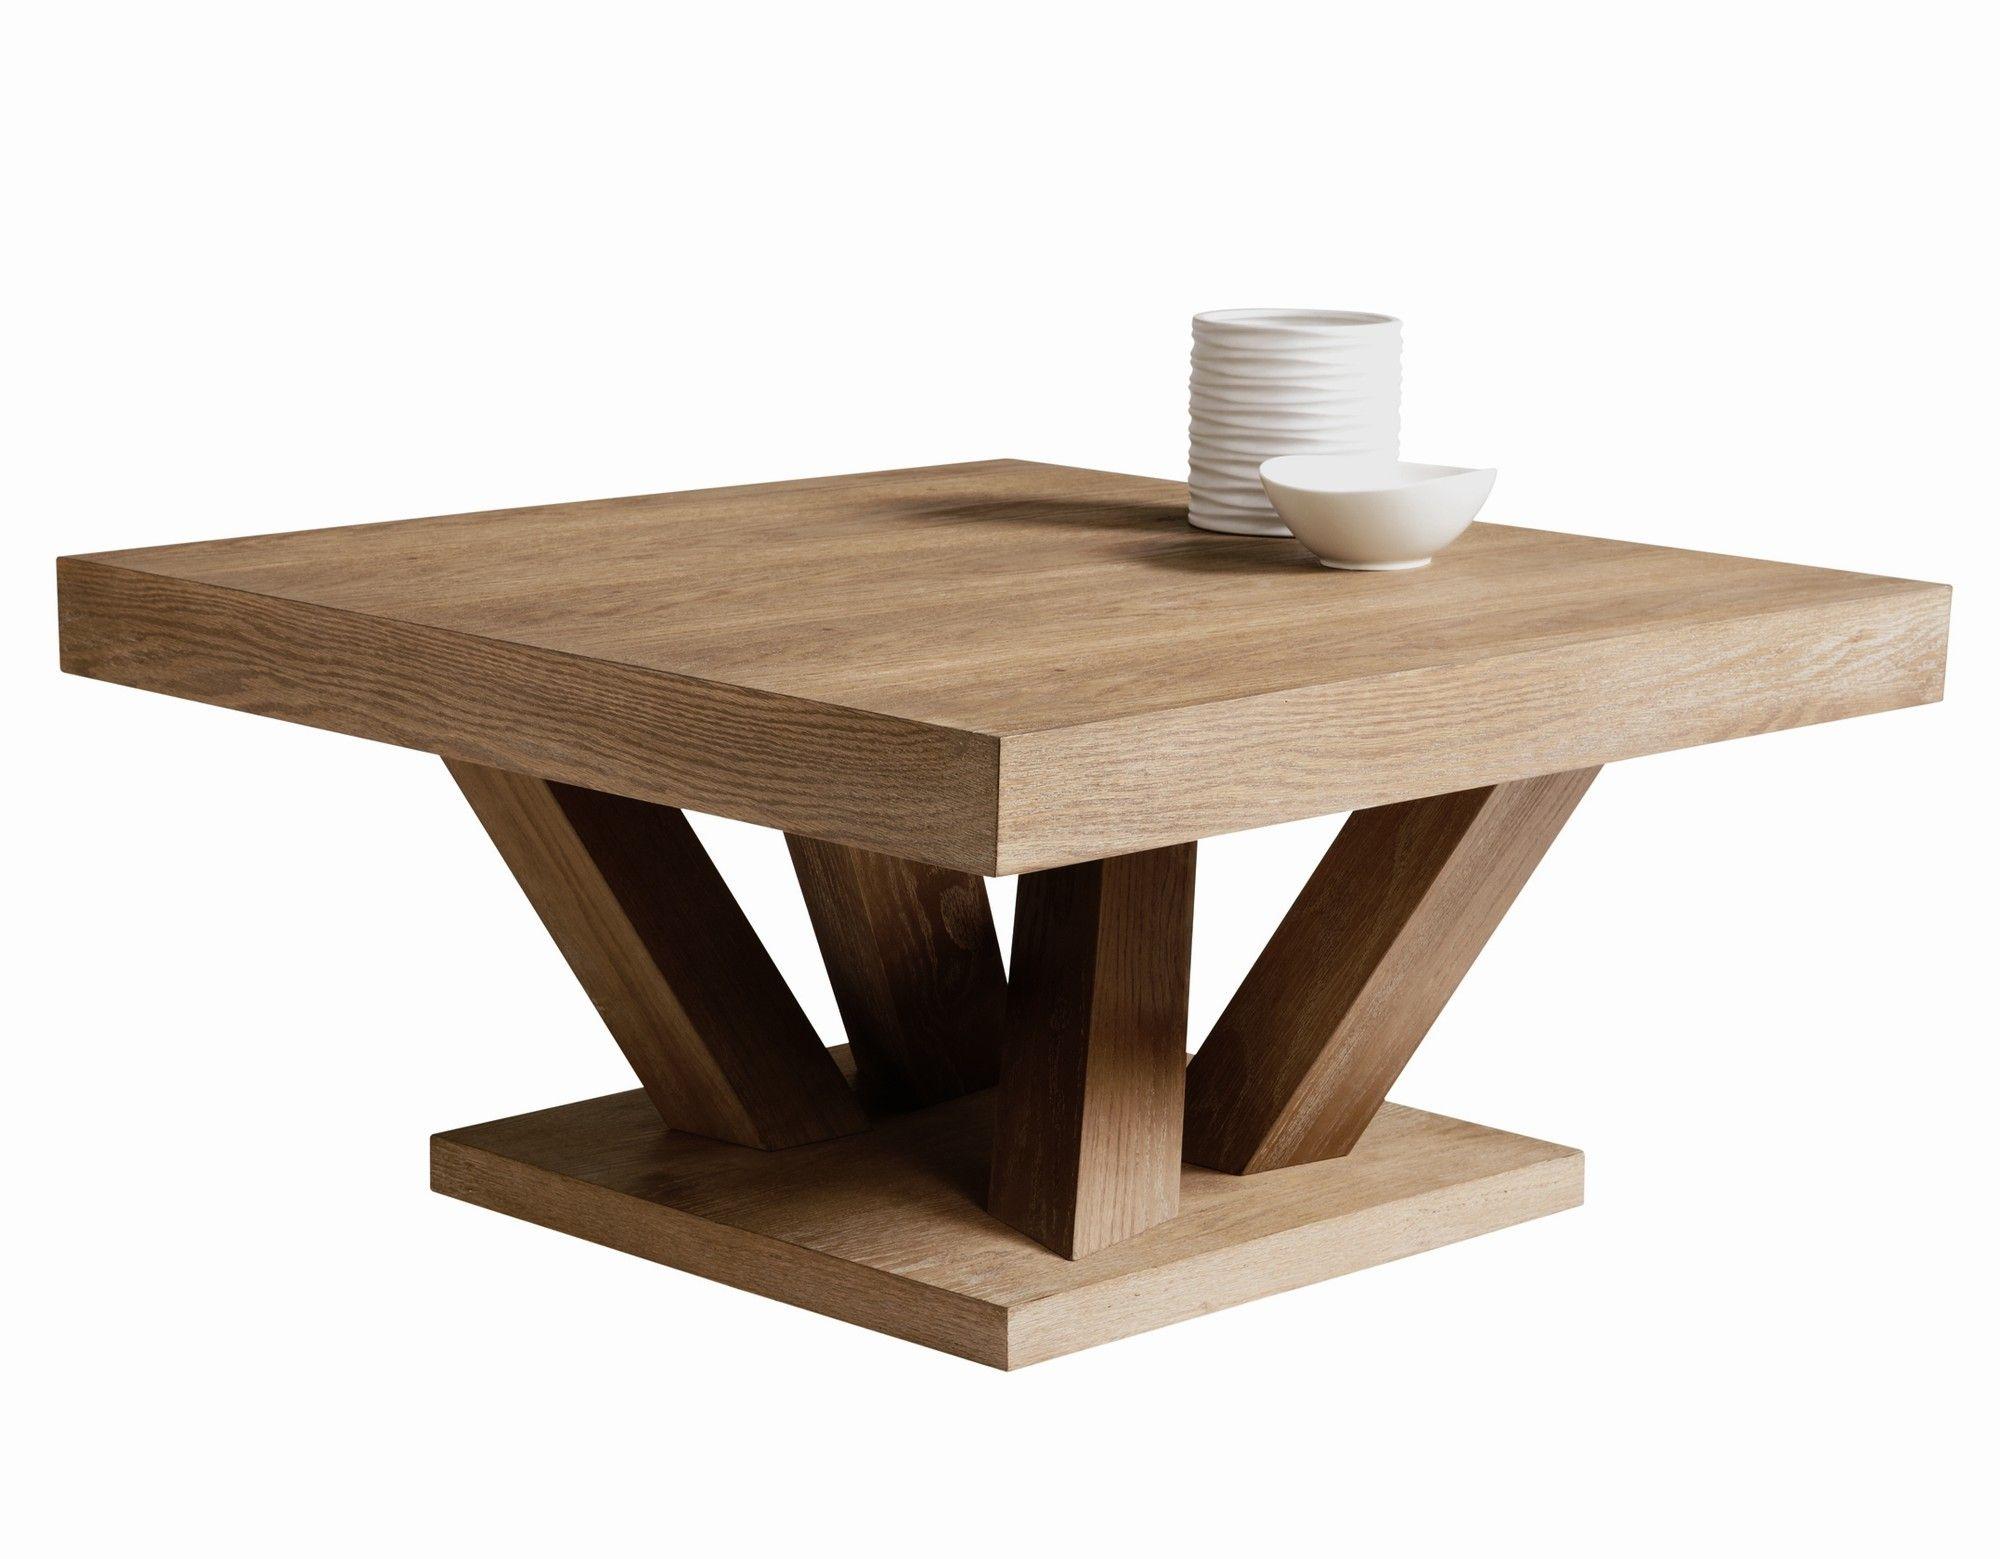 Coffee Tables Mesas De Vidrio Comedor Mesas Pequenas De Madera Mesas De Madera [ 1559 x 2000 Pixel ]